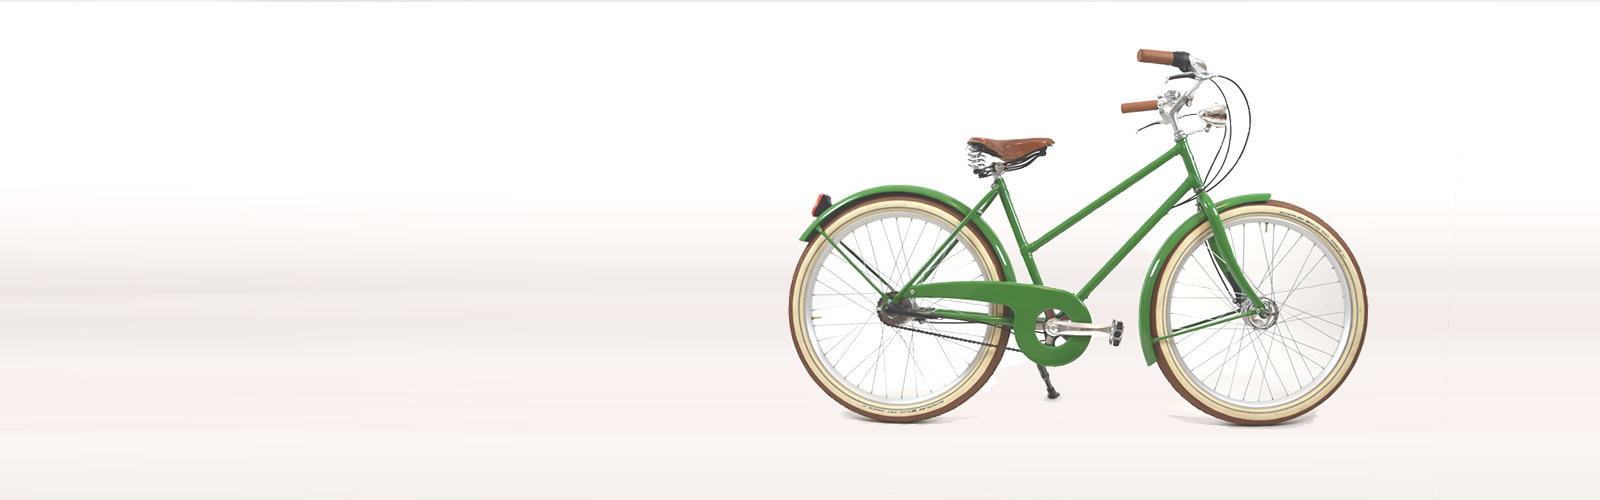 Biciclette Vintage Classiche E Biciclette Vintage Elettriche